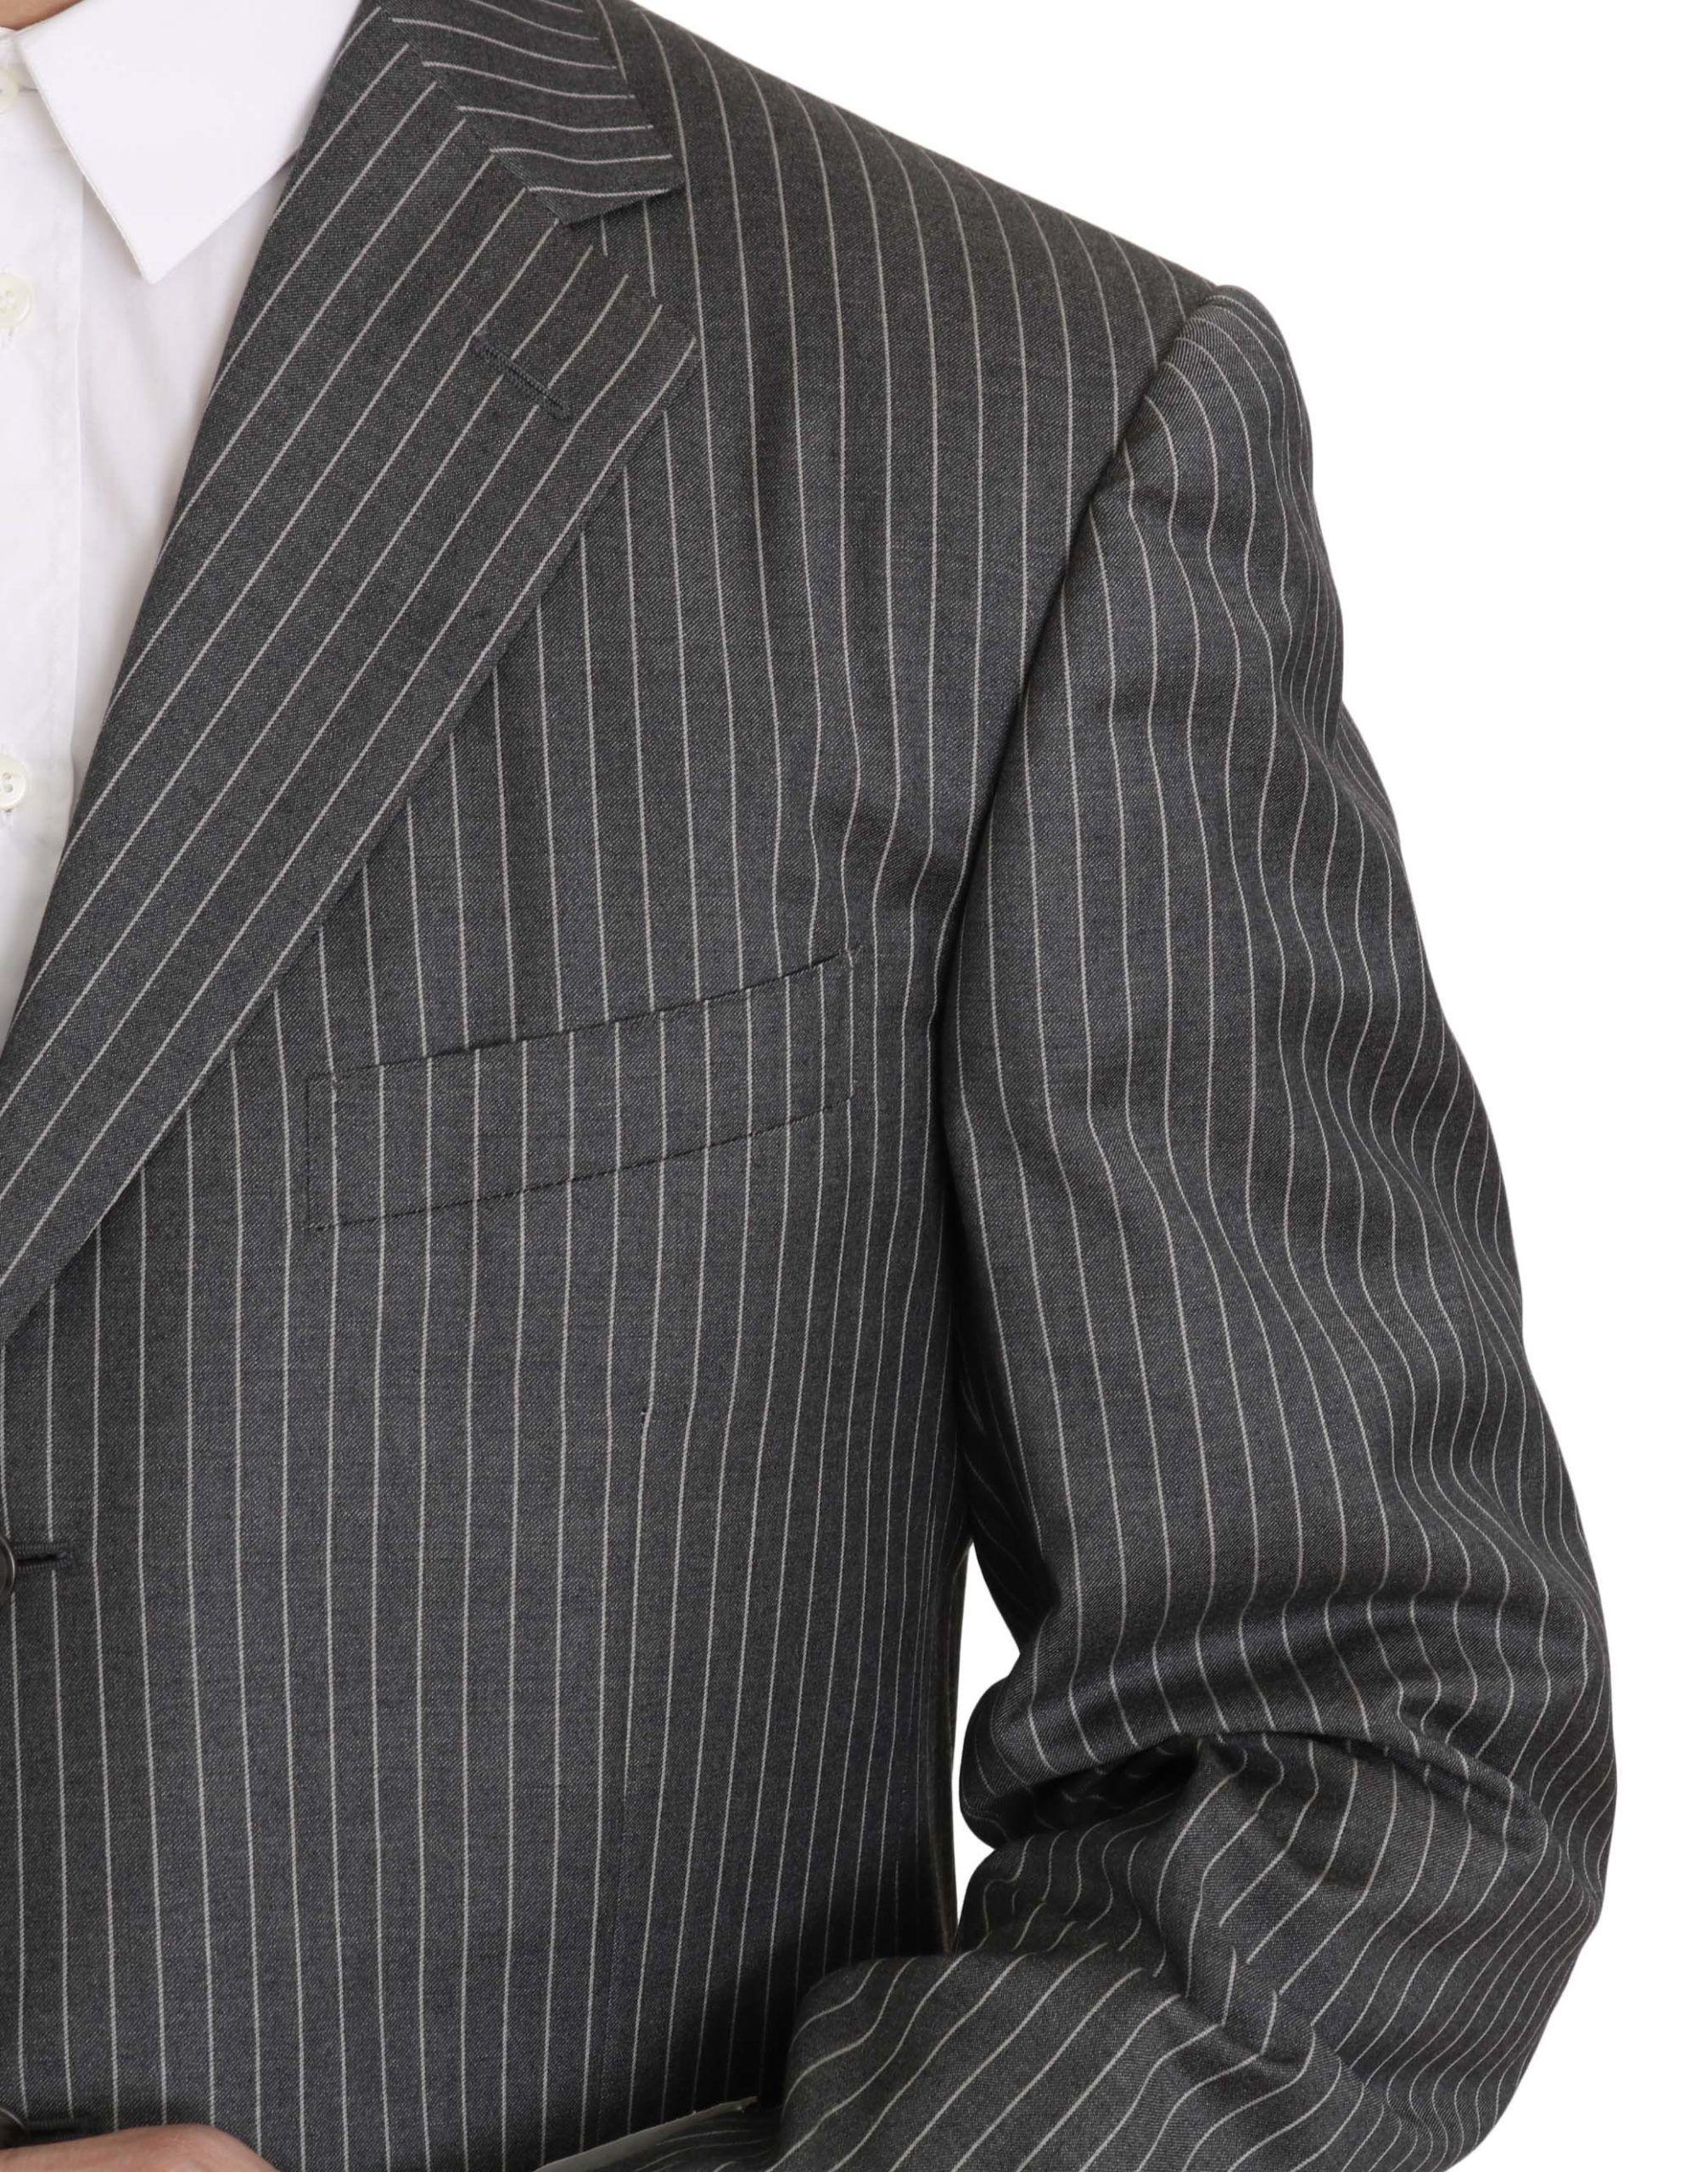 Ermenegildo Zegna Wool Gray Striped 2 Piece Suit